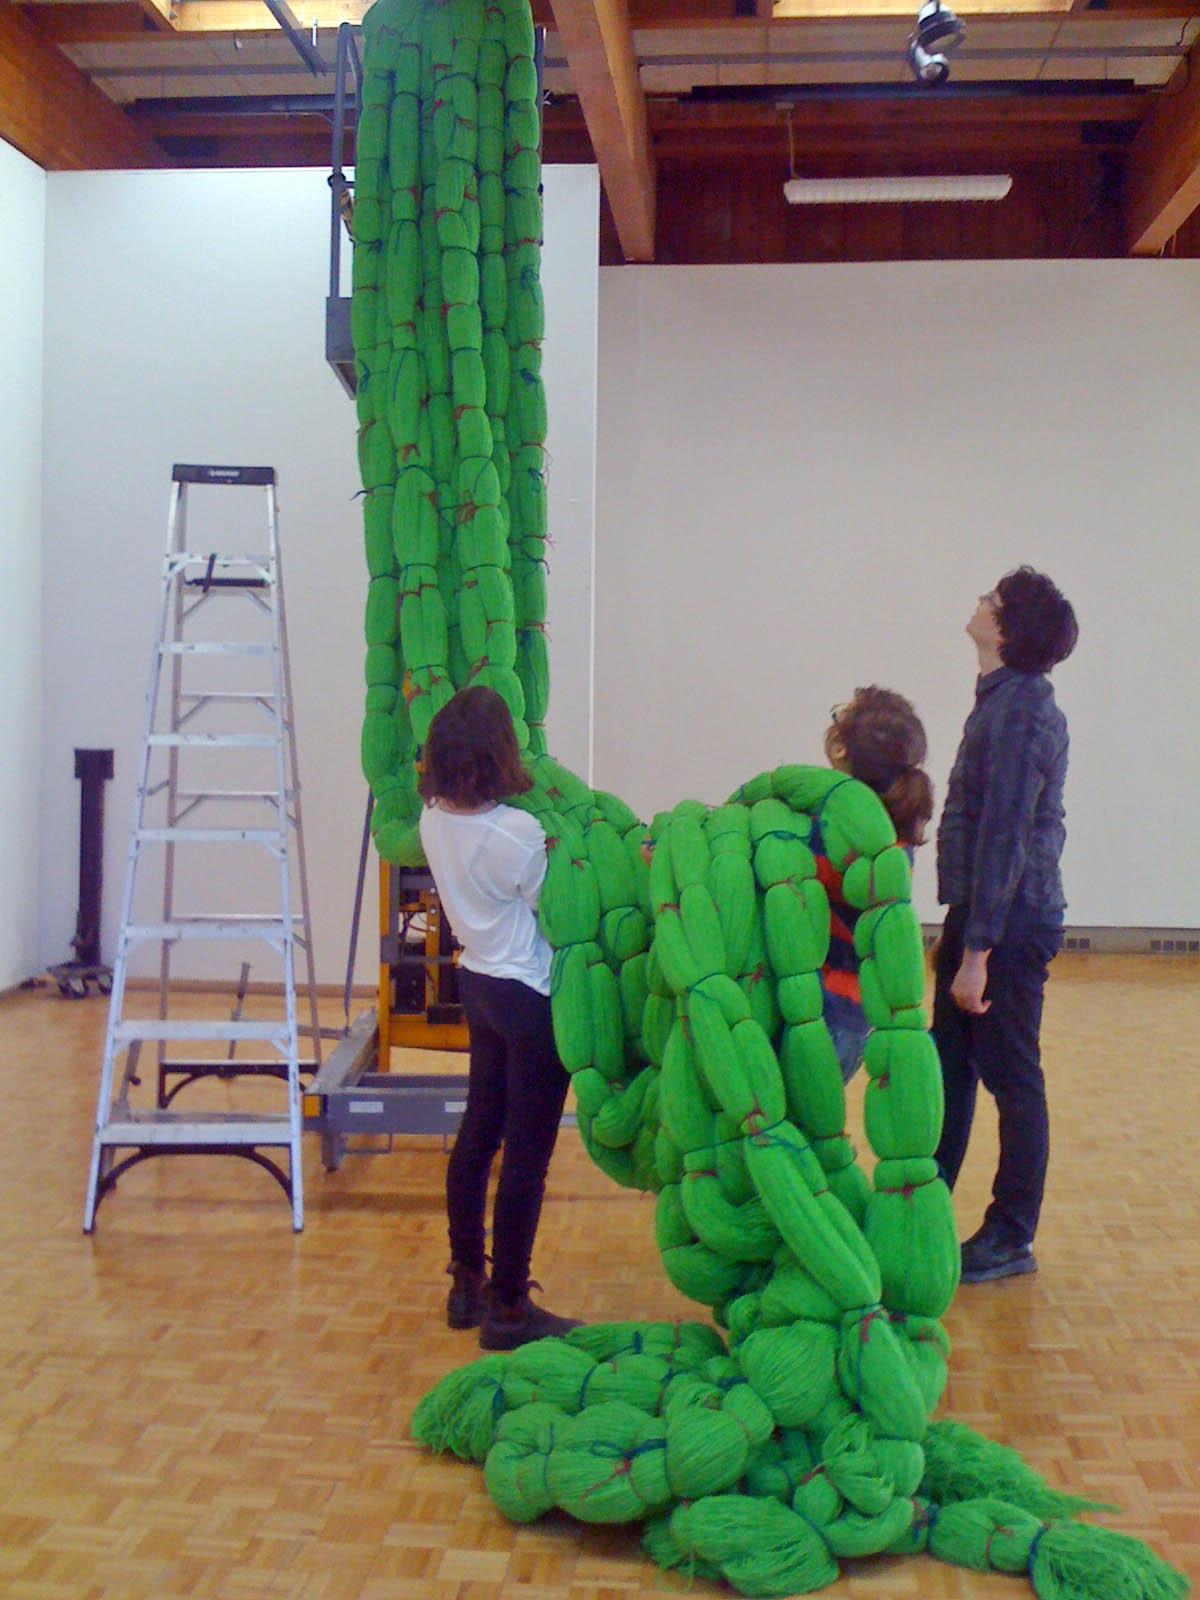 A Work in Progress: TRIM (Installation at Usdan Gallery, Bennington College), 2010, Acrylic yarn, 14' x 40' x 80' (Work in progress)